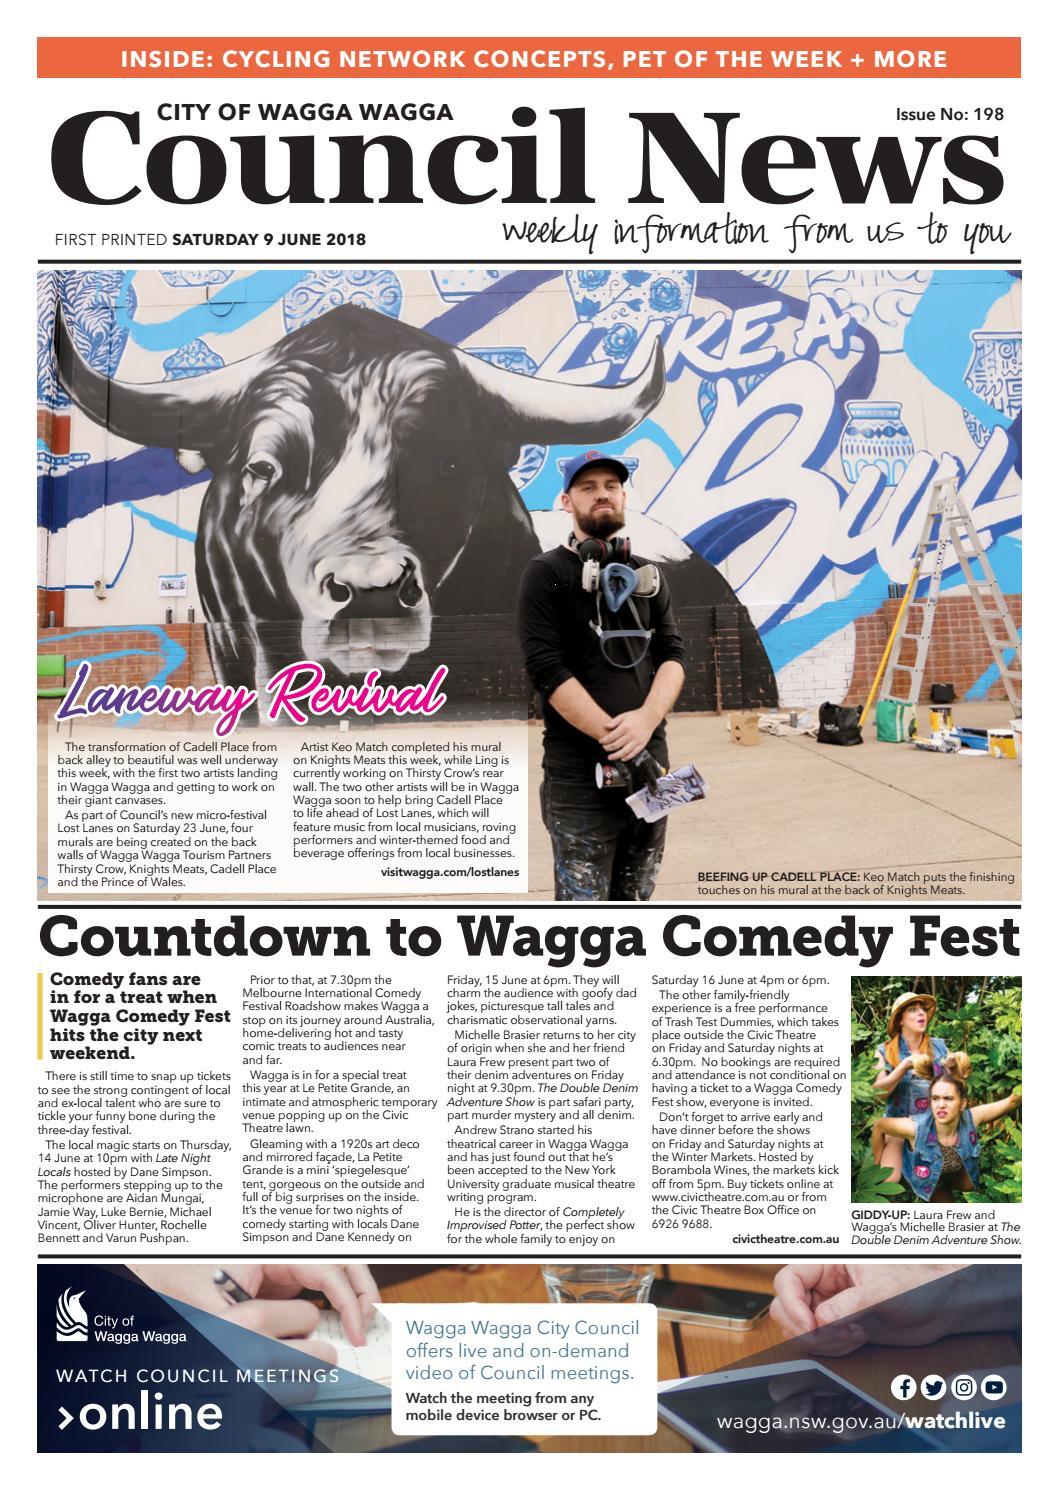 Council News #198 - 9 June 2018 by Wagga Wagga City Council